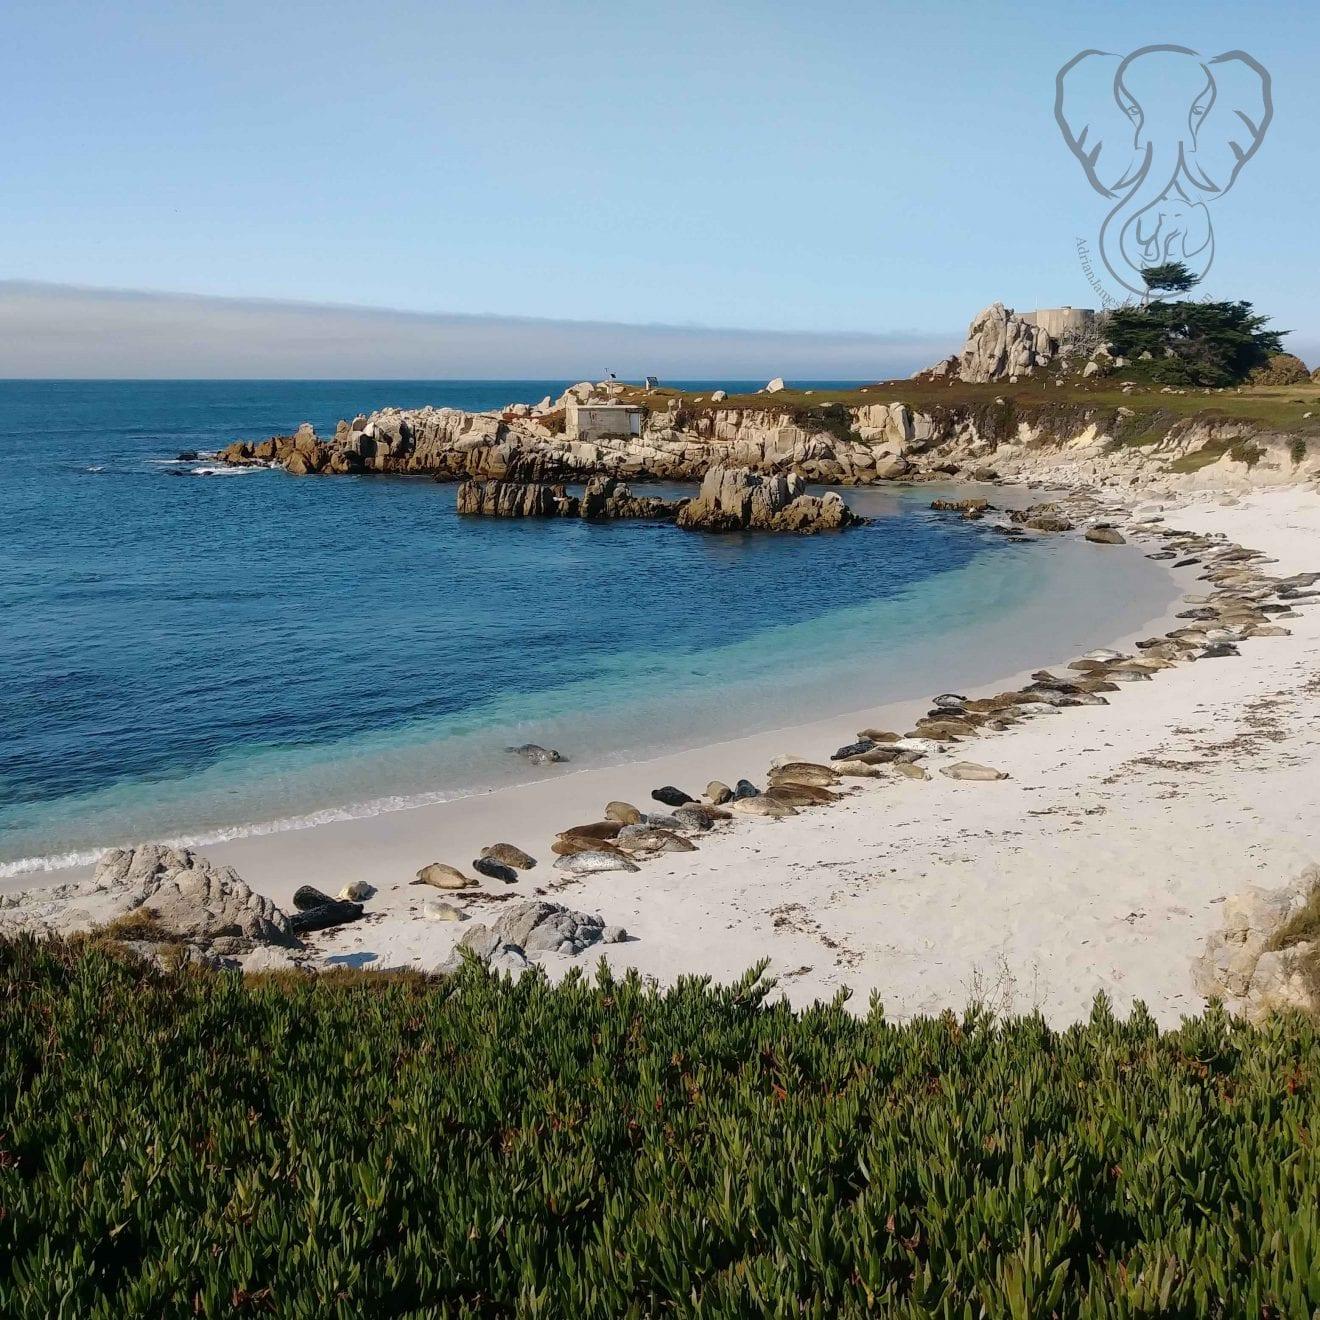 Sea lions on the California coast (Miranda Hernandez)